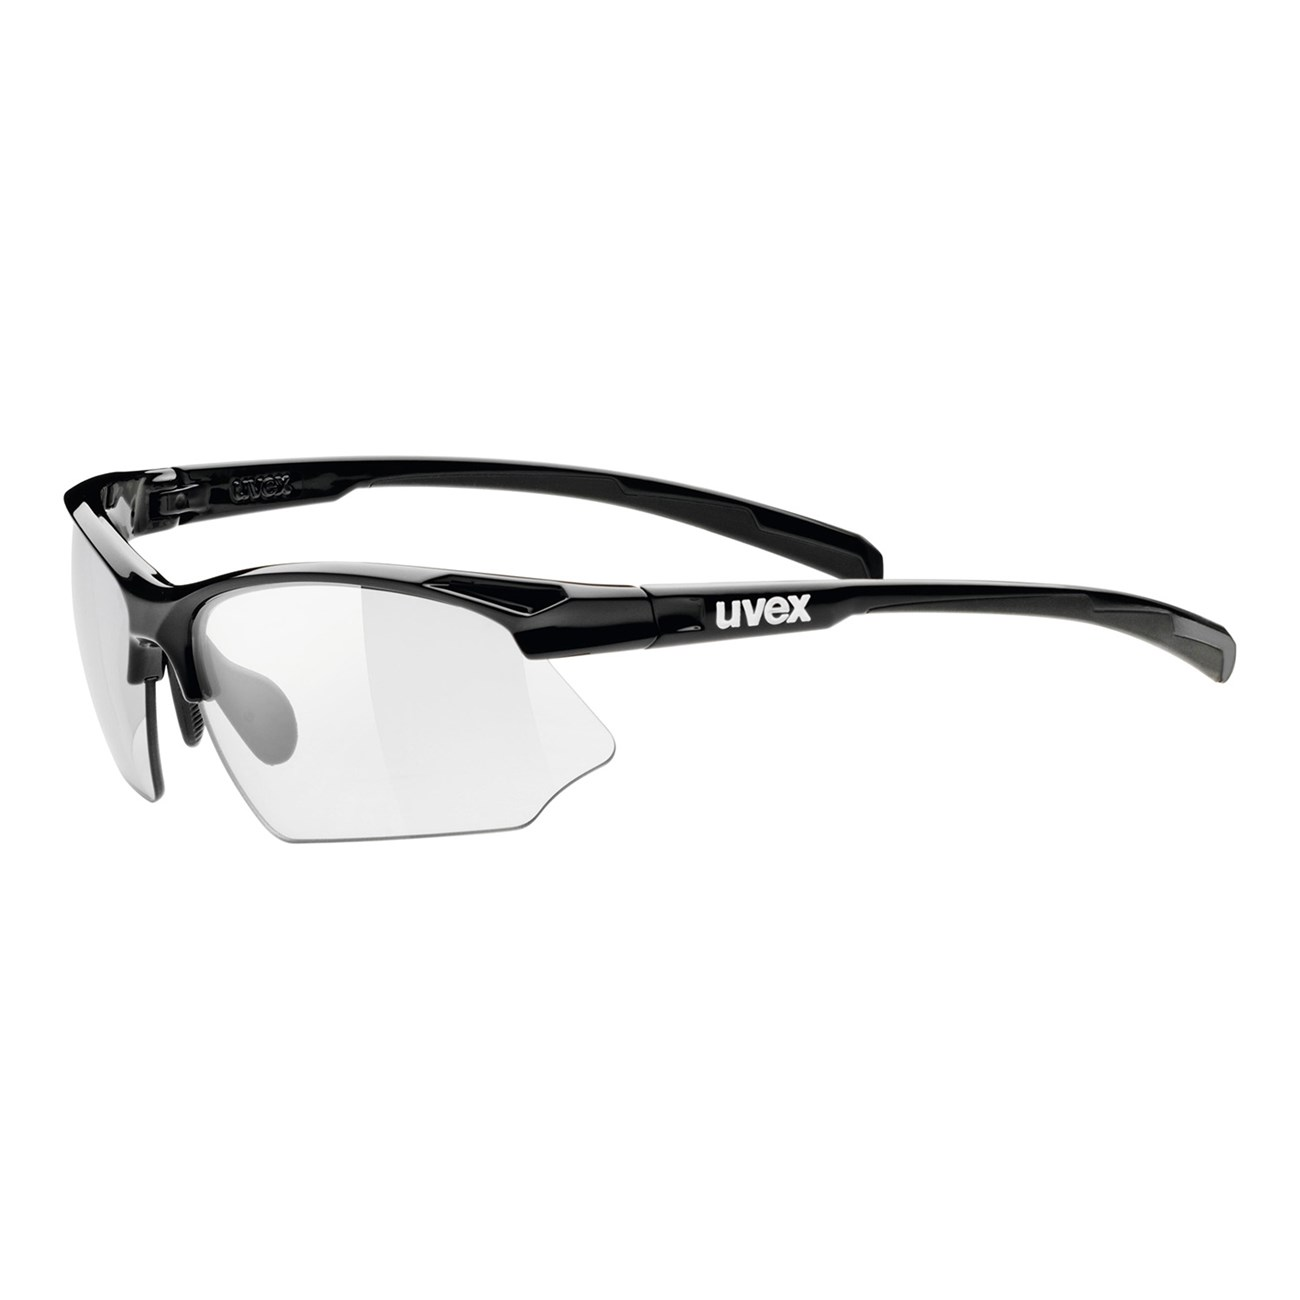 968e28821a UVEX sportstyle 802 vario   Γυαλιά Ηλίου για Τρέξιμο